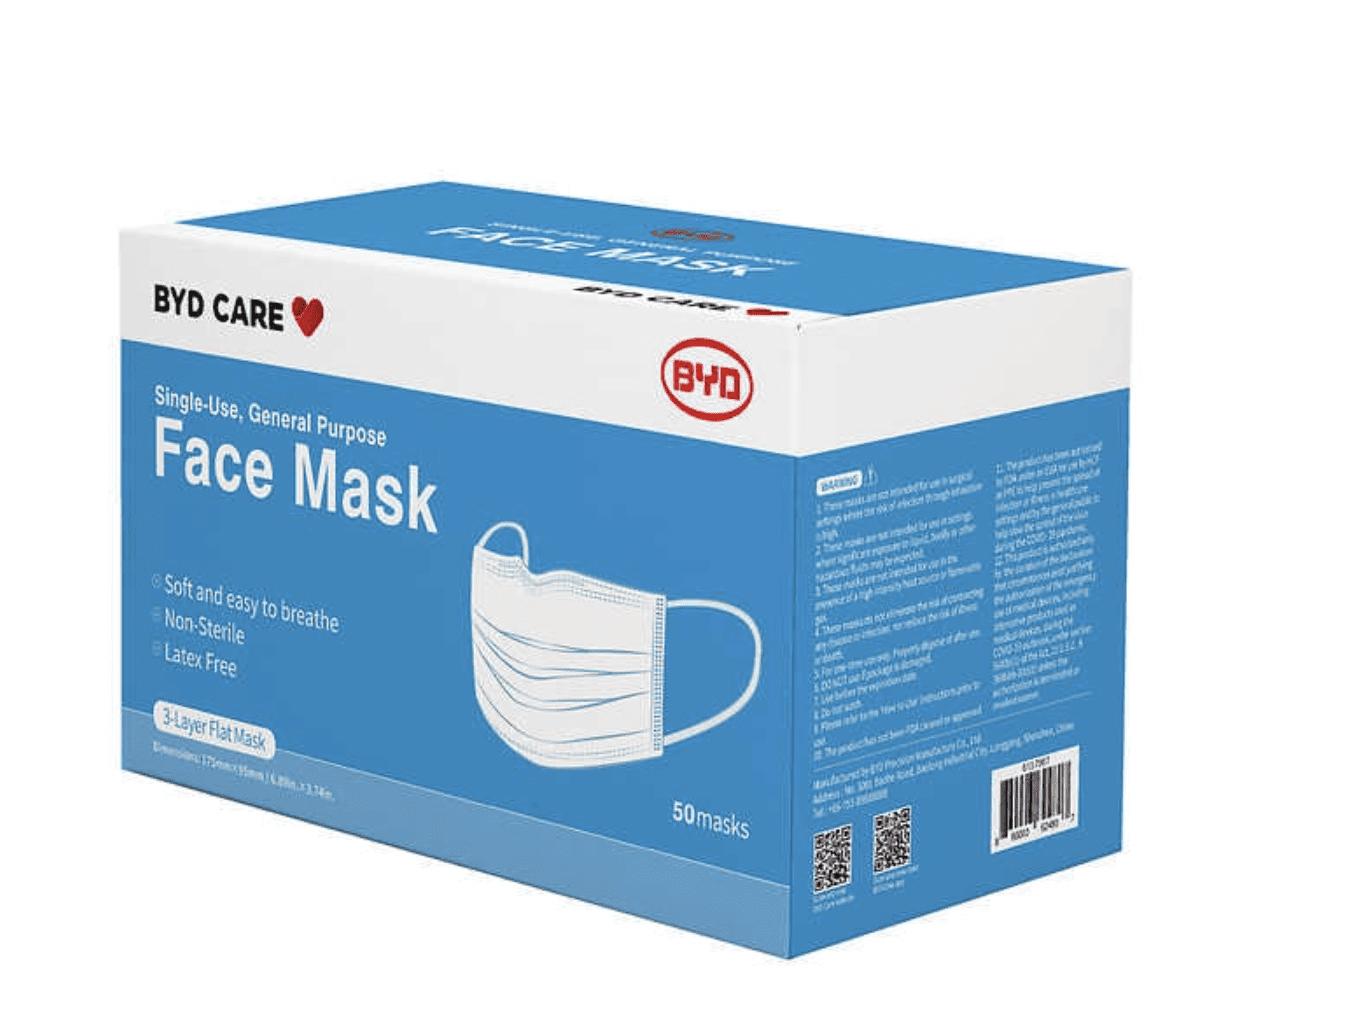 Costco: Single Use Face Mask, 50 Masks for .99